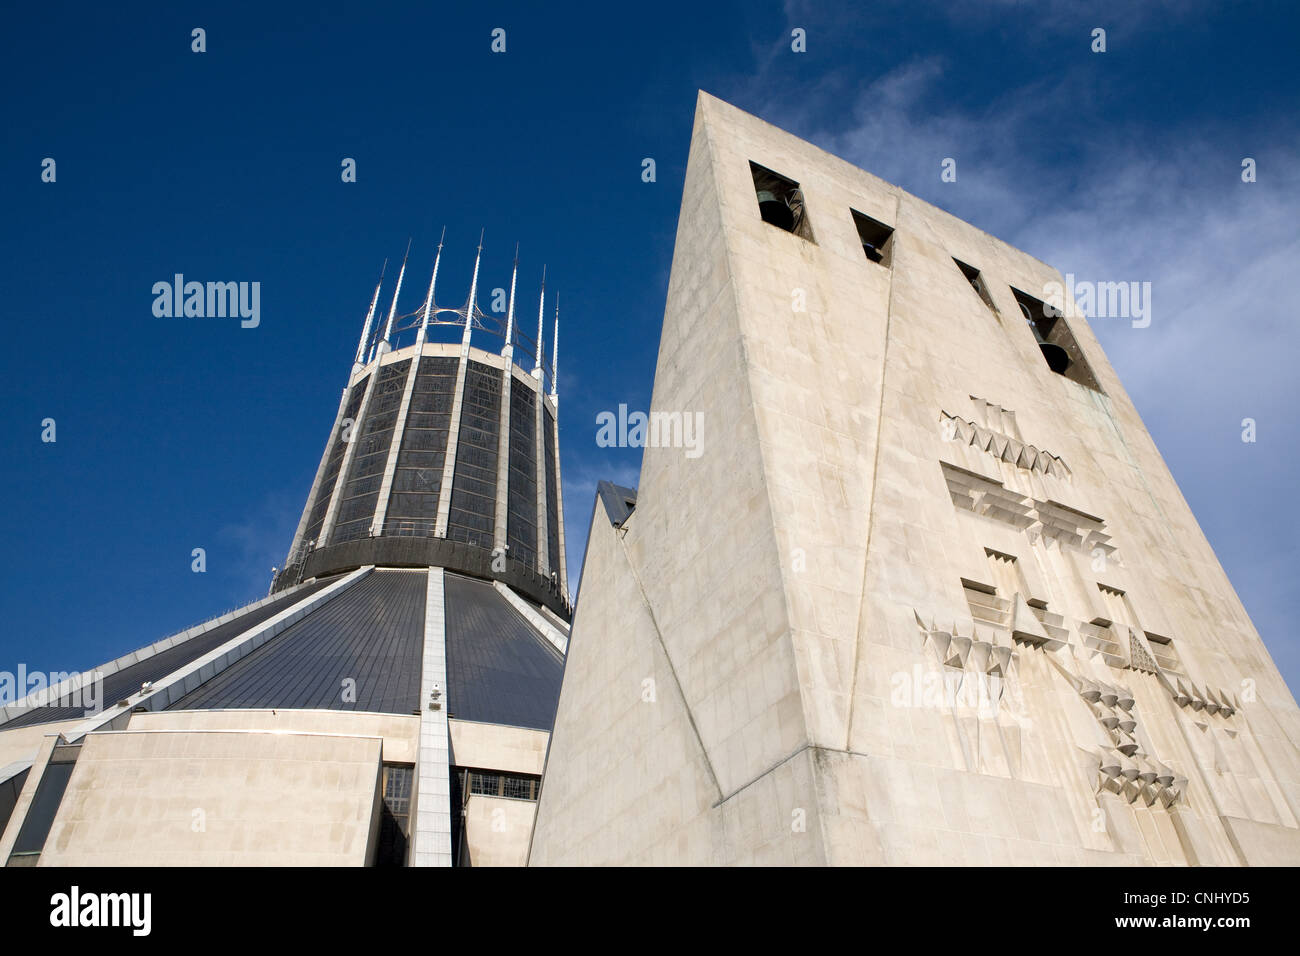 Liverpool Metropolitan Cathedral, Liverpool, UK Stockbild